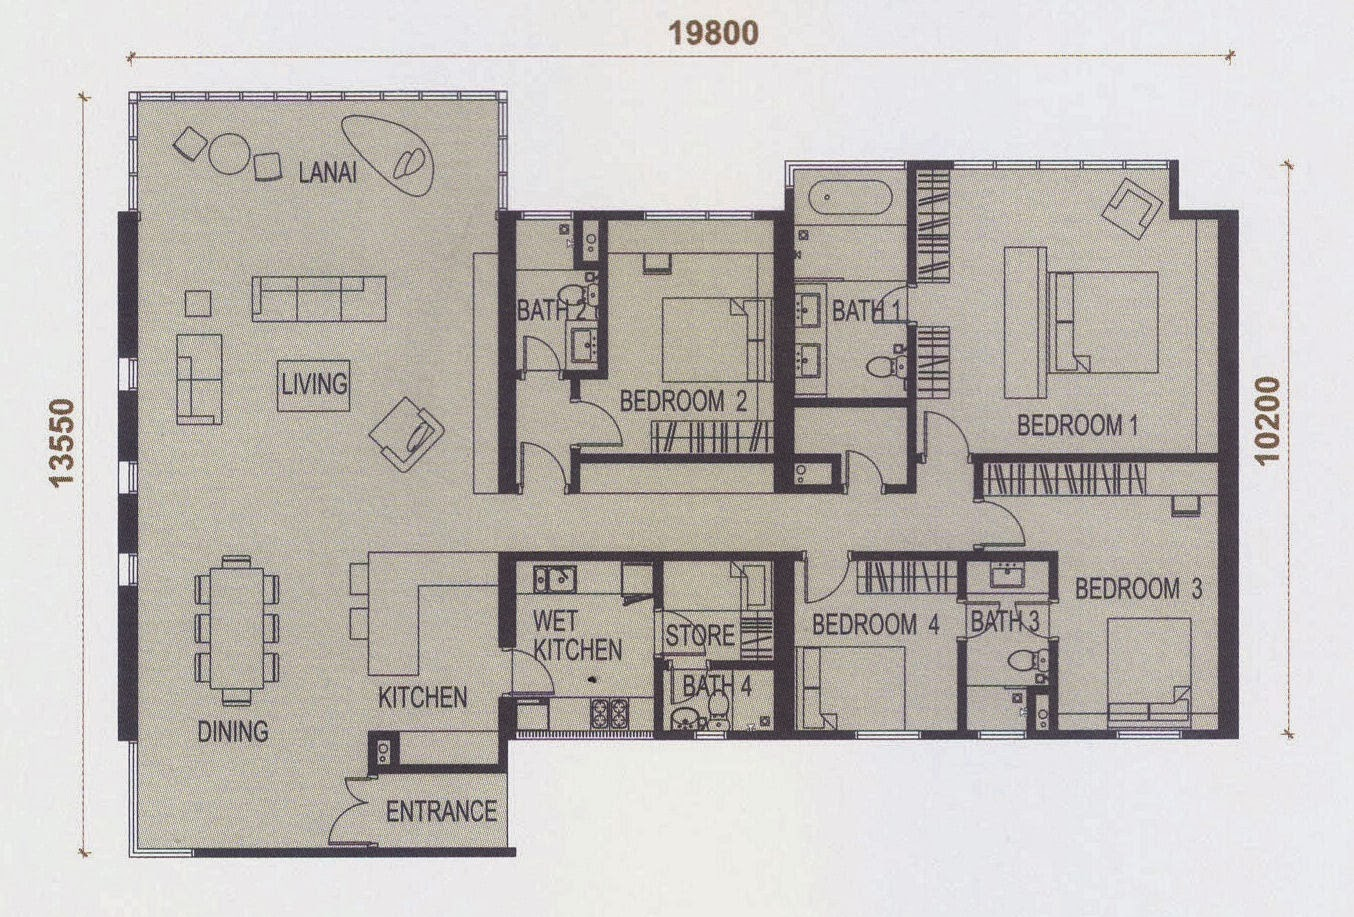 Floor plan feng shui elevia residences condominium for Best feng shui floor plan